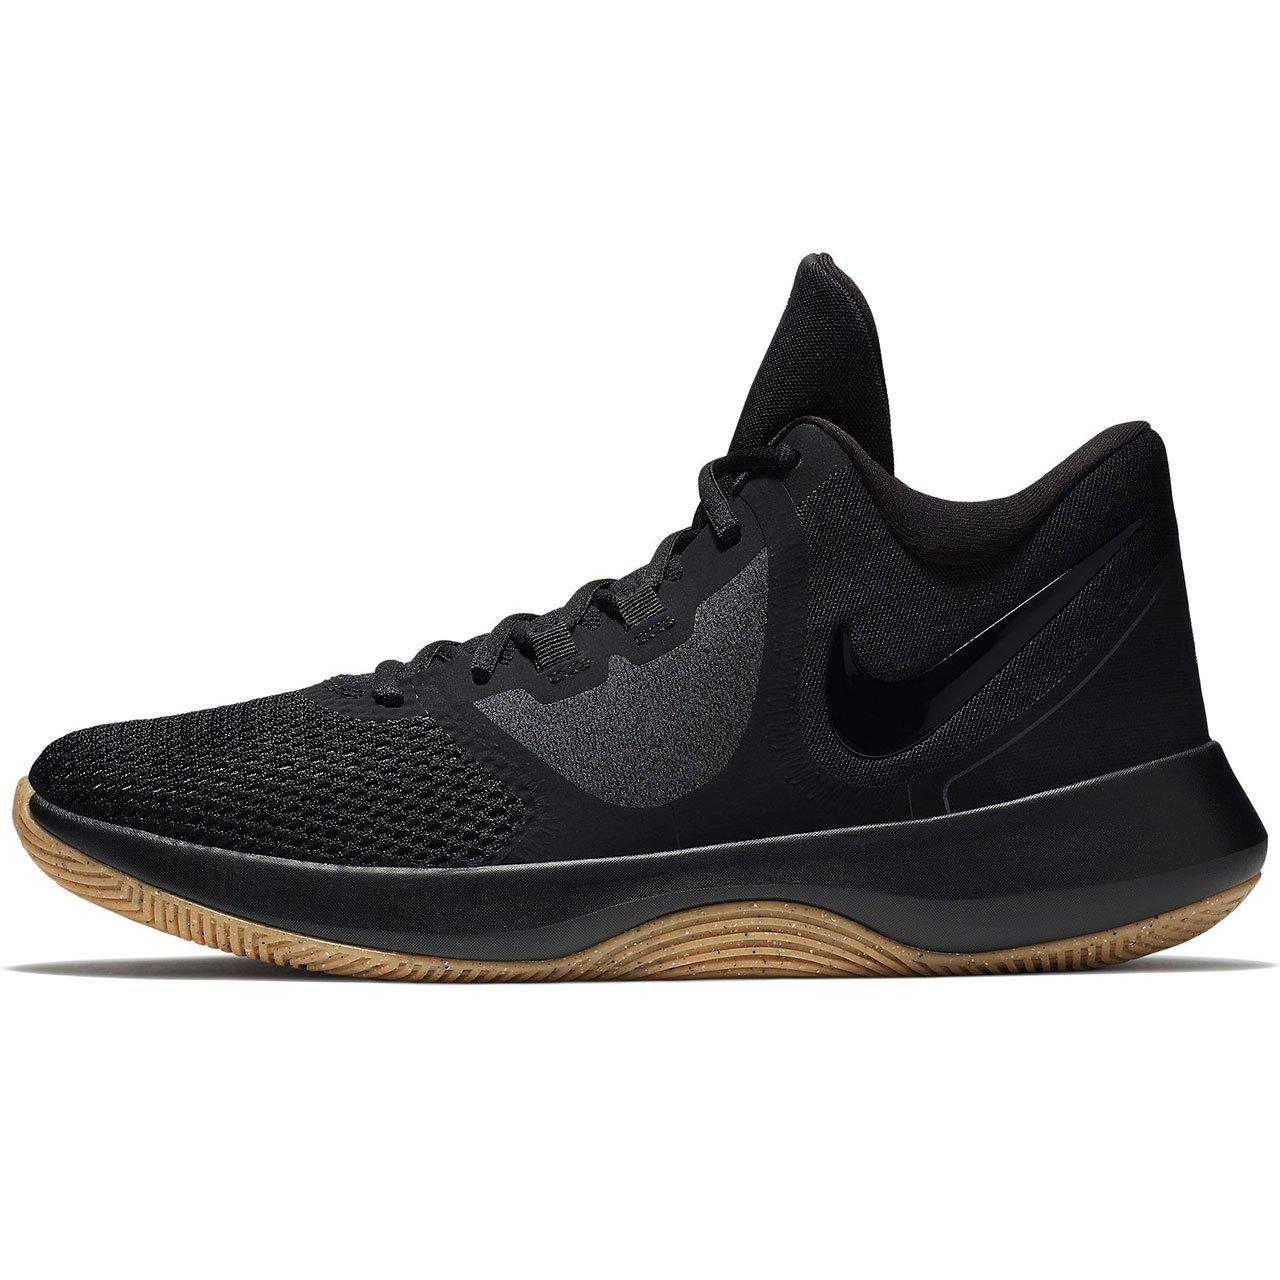 Nike Air Precision Basketballschuhe Schwarz Weiß 001